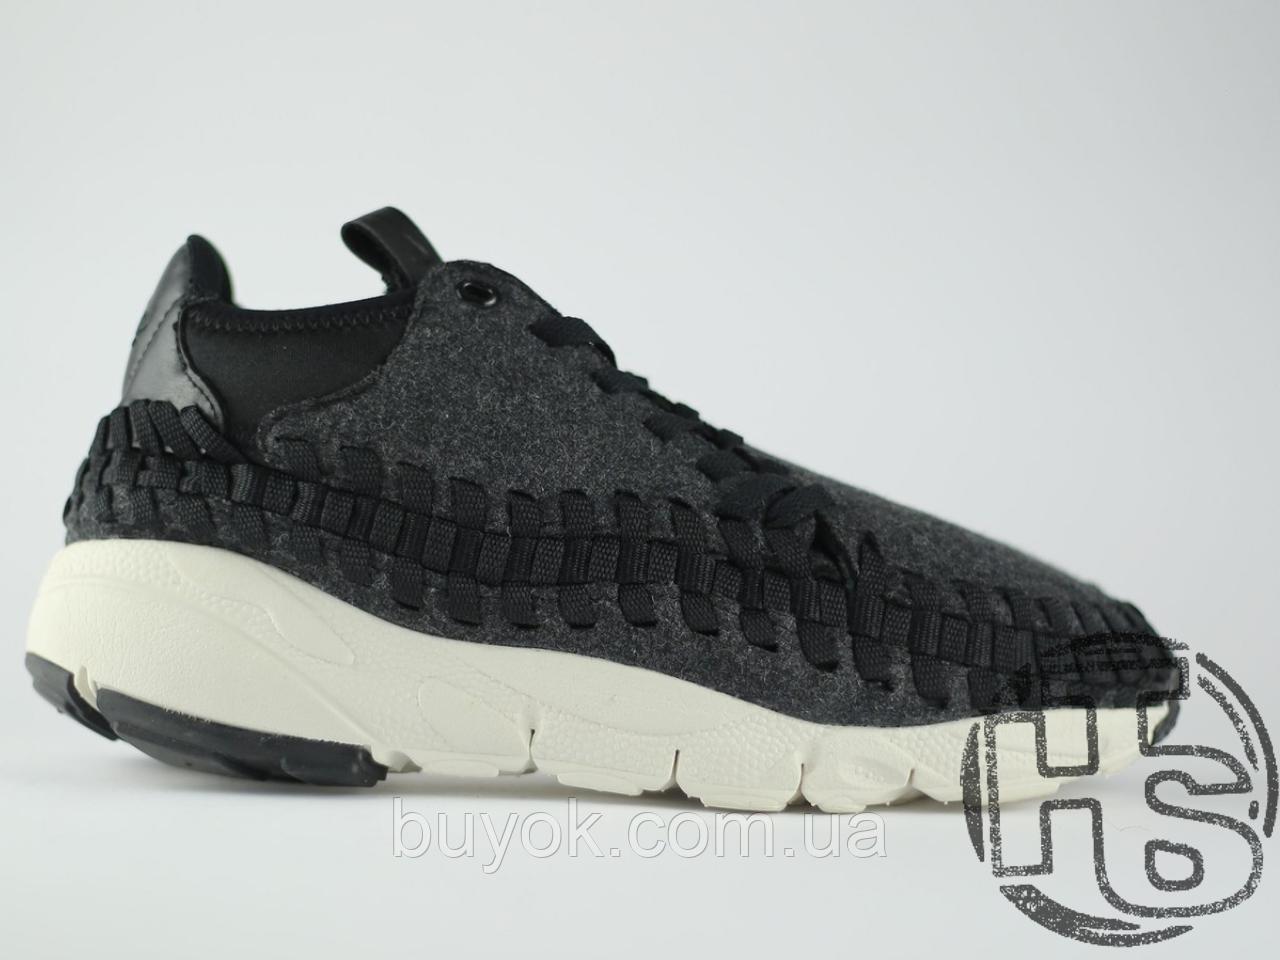 Чоловічі кросівки Nike Air Footscape Woven Chukka SE Black/Grey/White 443686-004